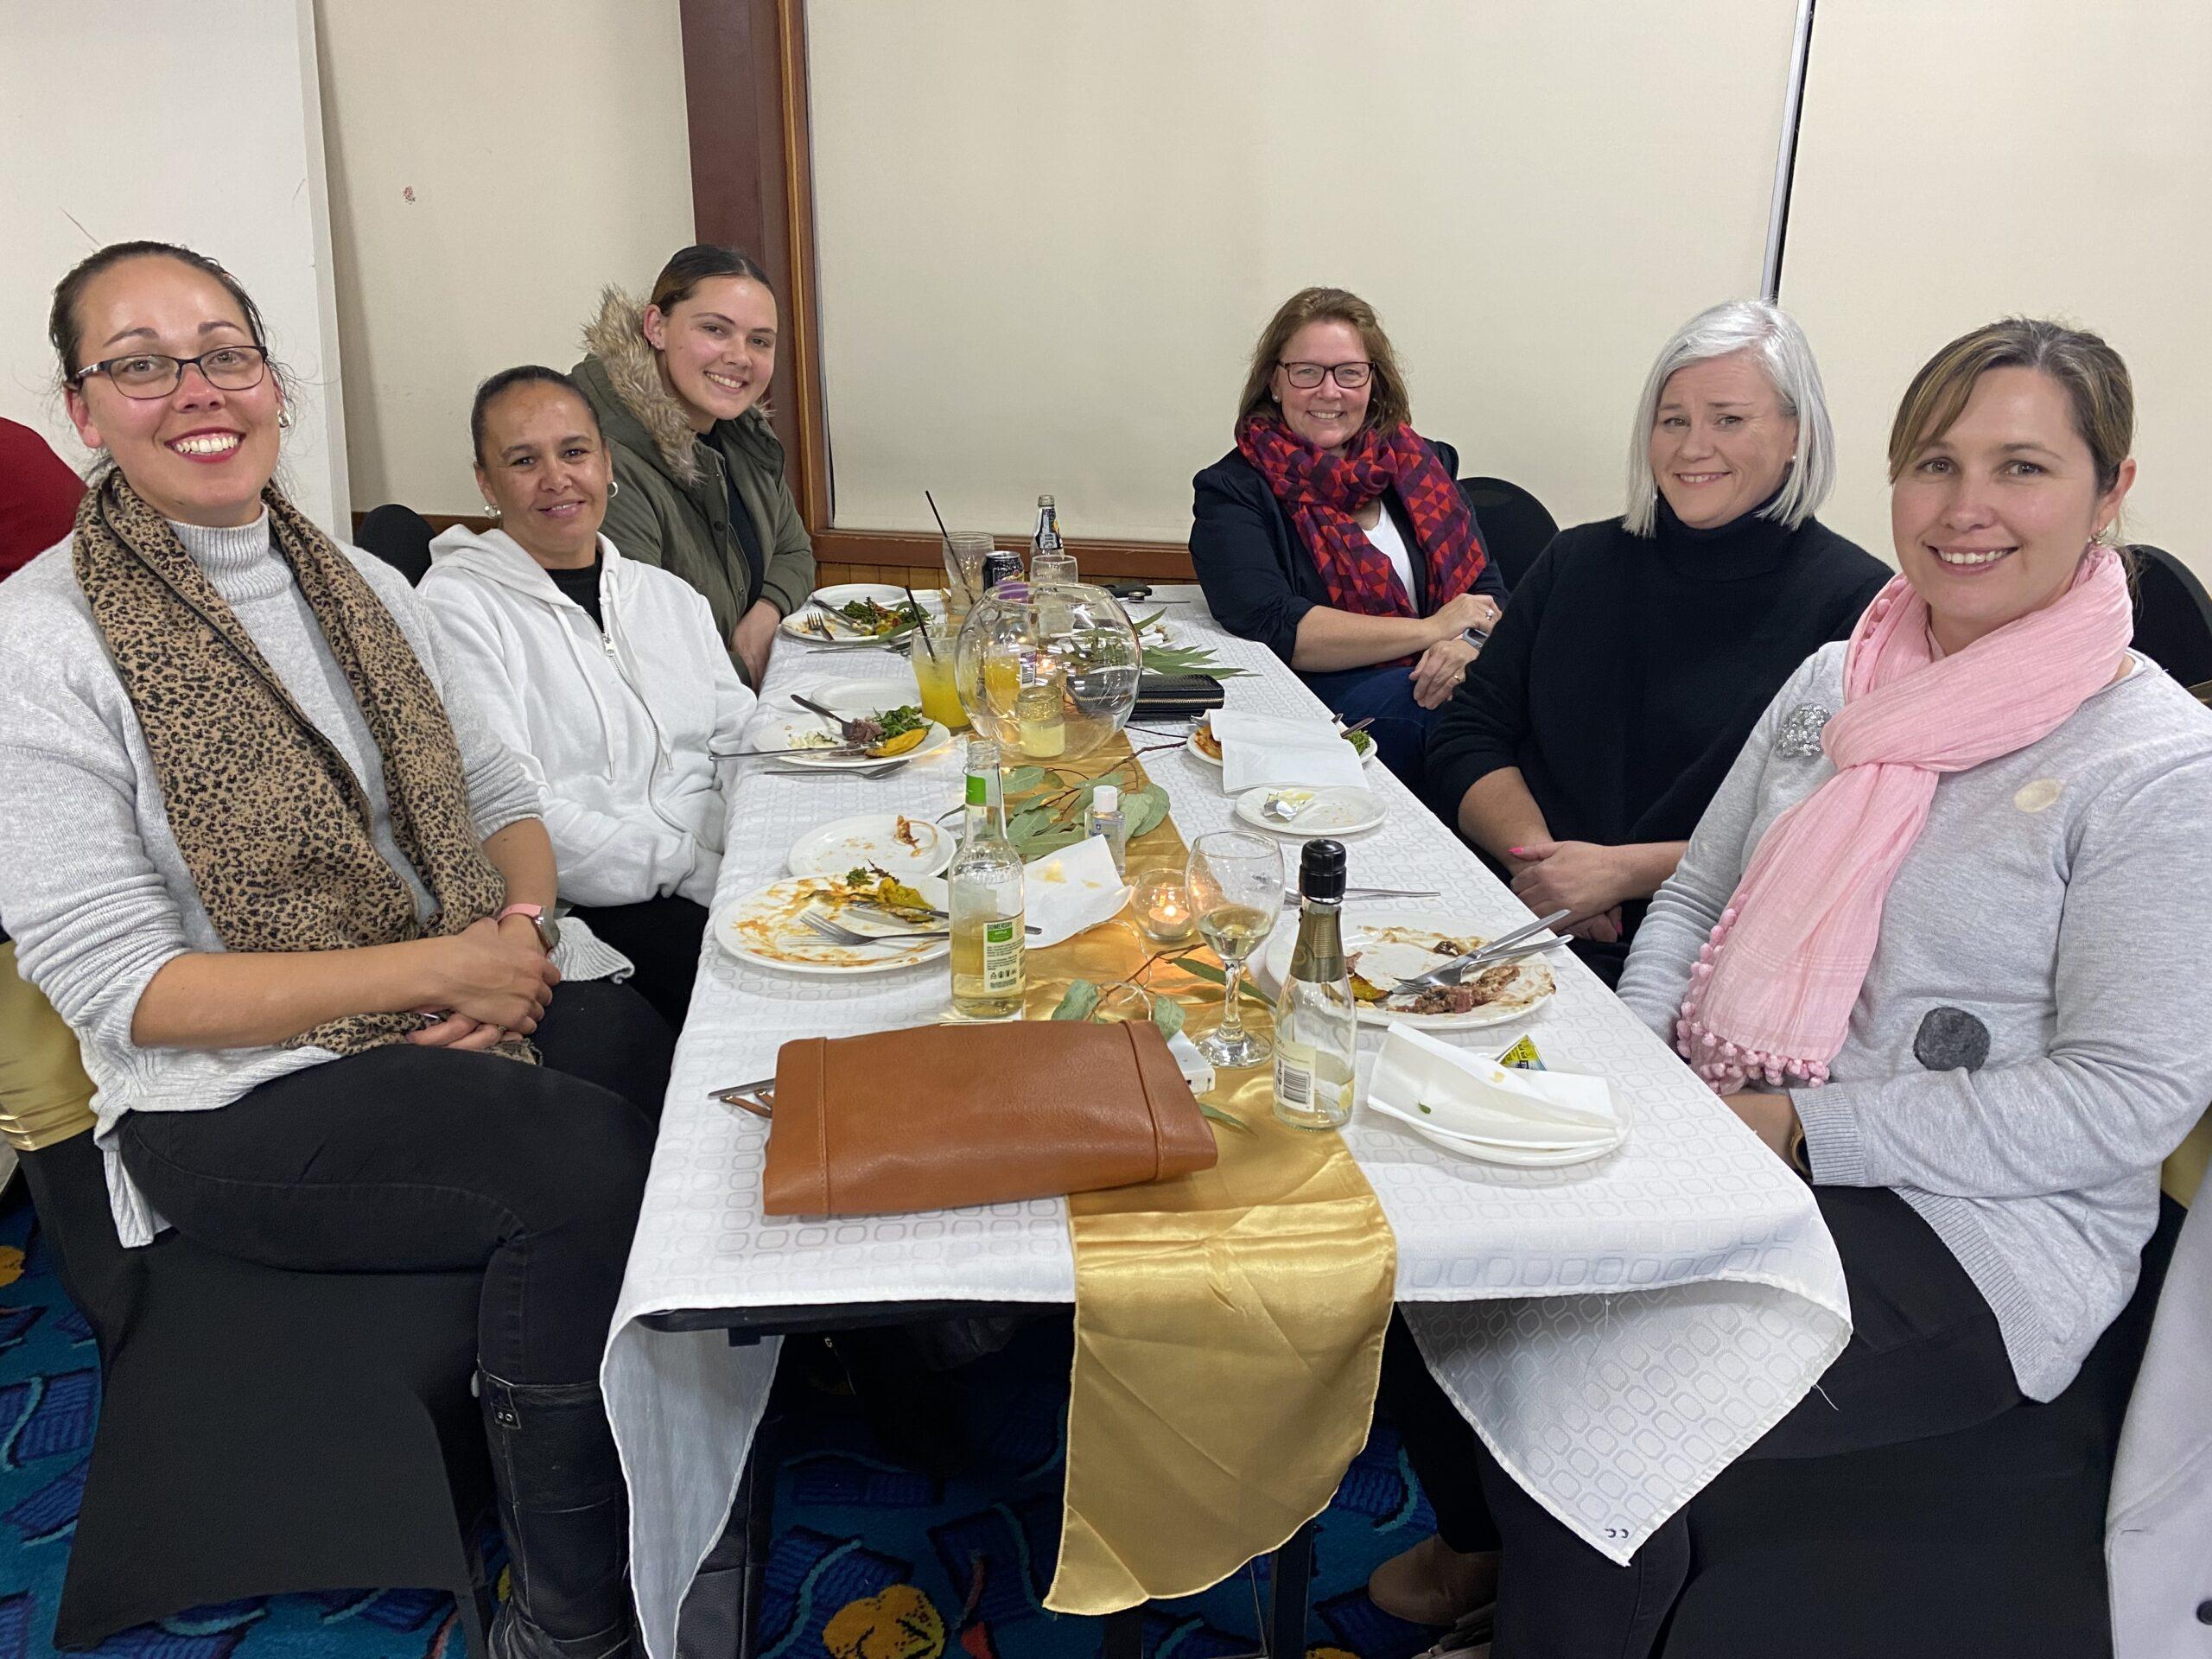 Left, Monique Soutter, Kristy Fuller and Vanessa Smallwood, right, Deanne Stanfield, Liz Webster and Karlee Hatton.